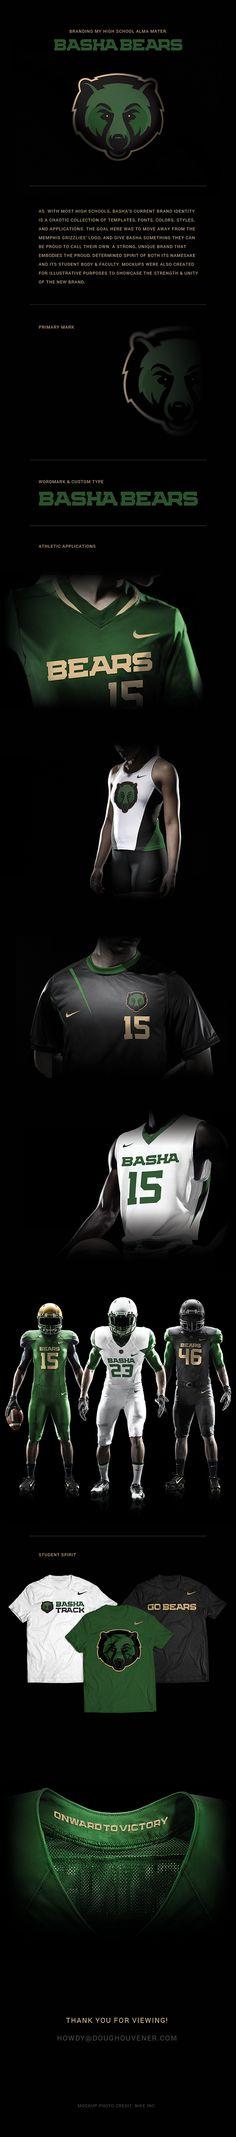 Rebranding My Alma Mater: Basha High School on Behance